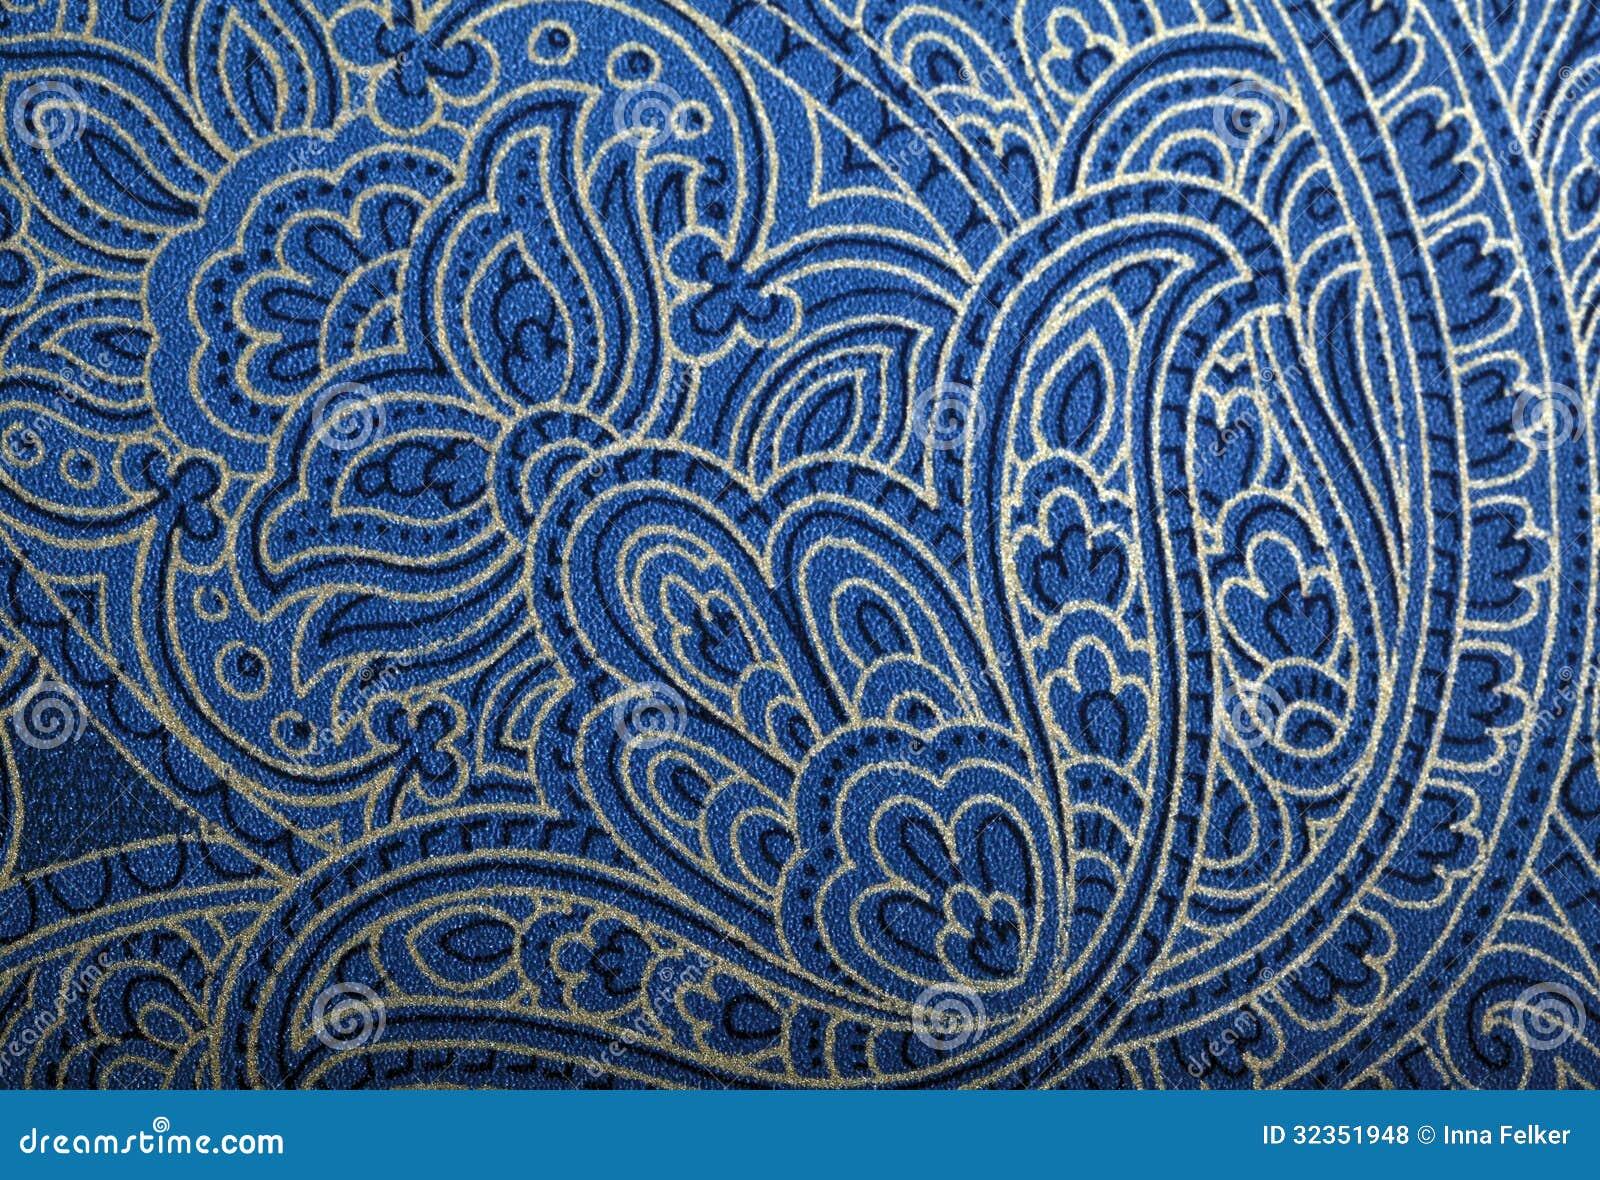 Vintage wallpaper with vignette pattern royalty free stock photos image 32 - Papier peint vintage bleu ...